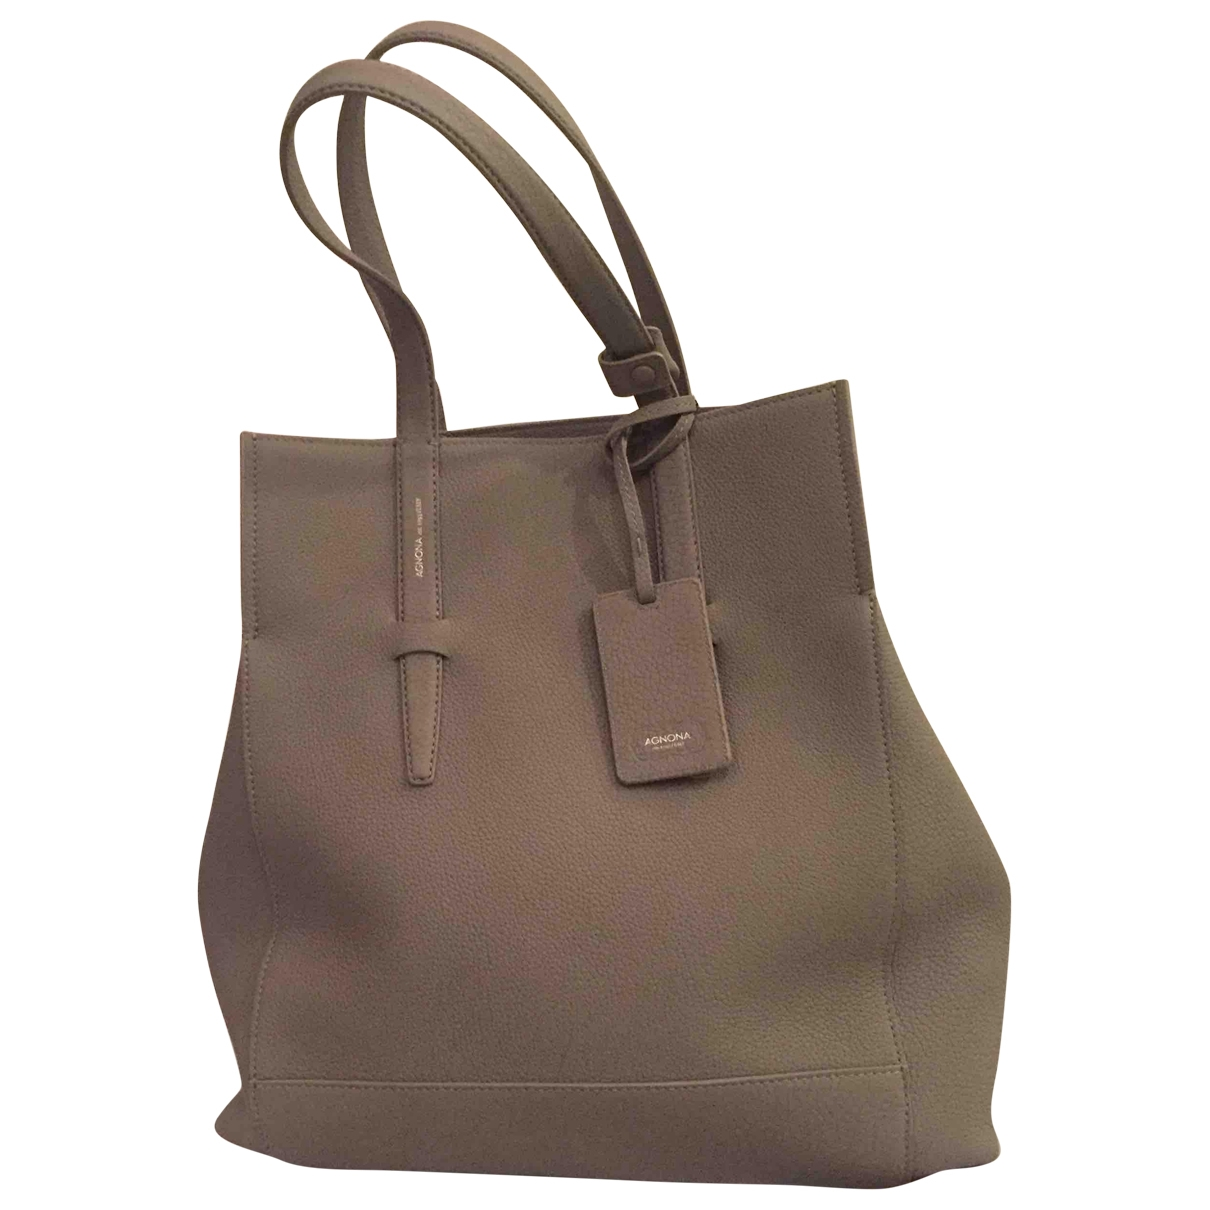 Agnona \N Handtasche in  Grau Leder